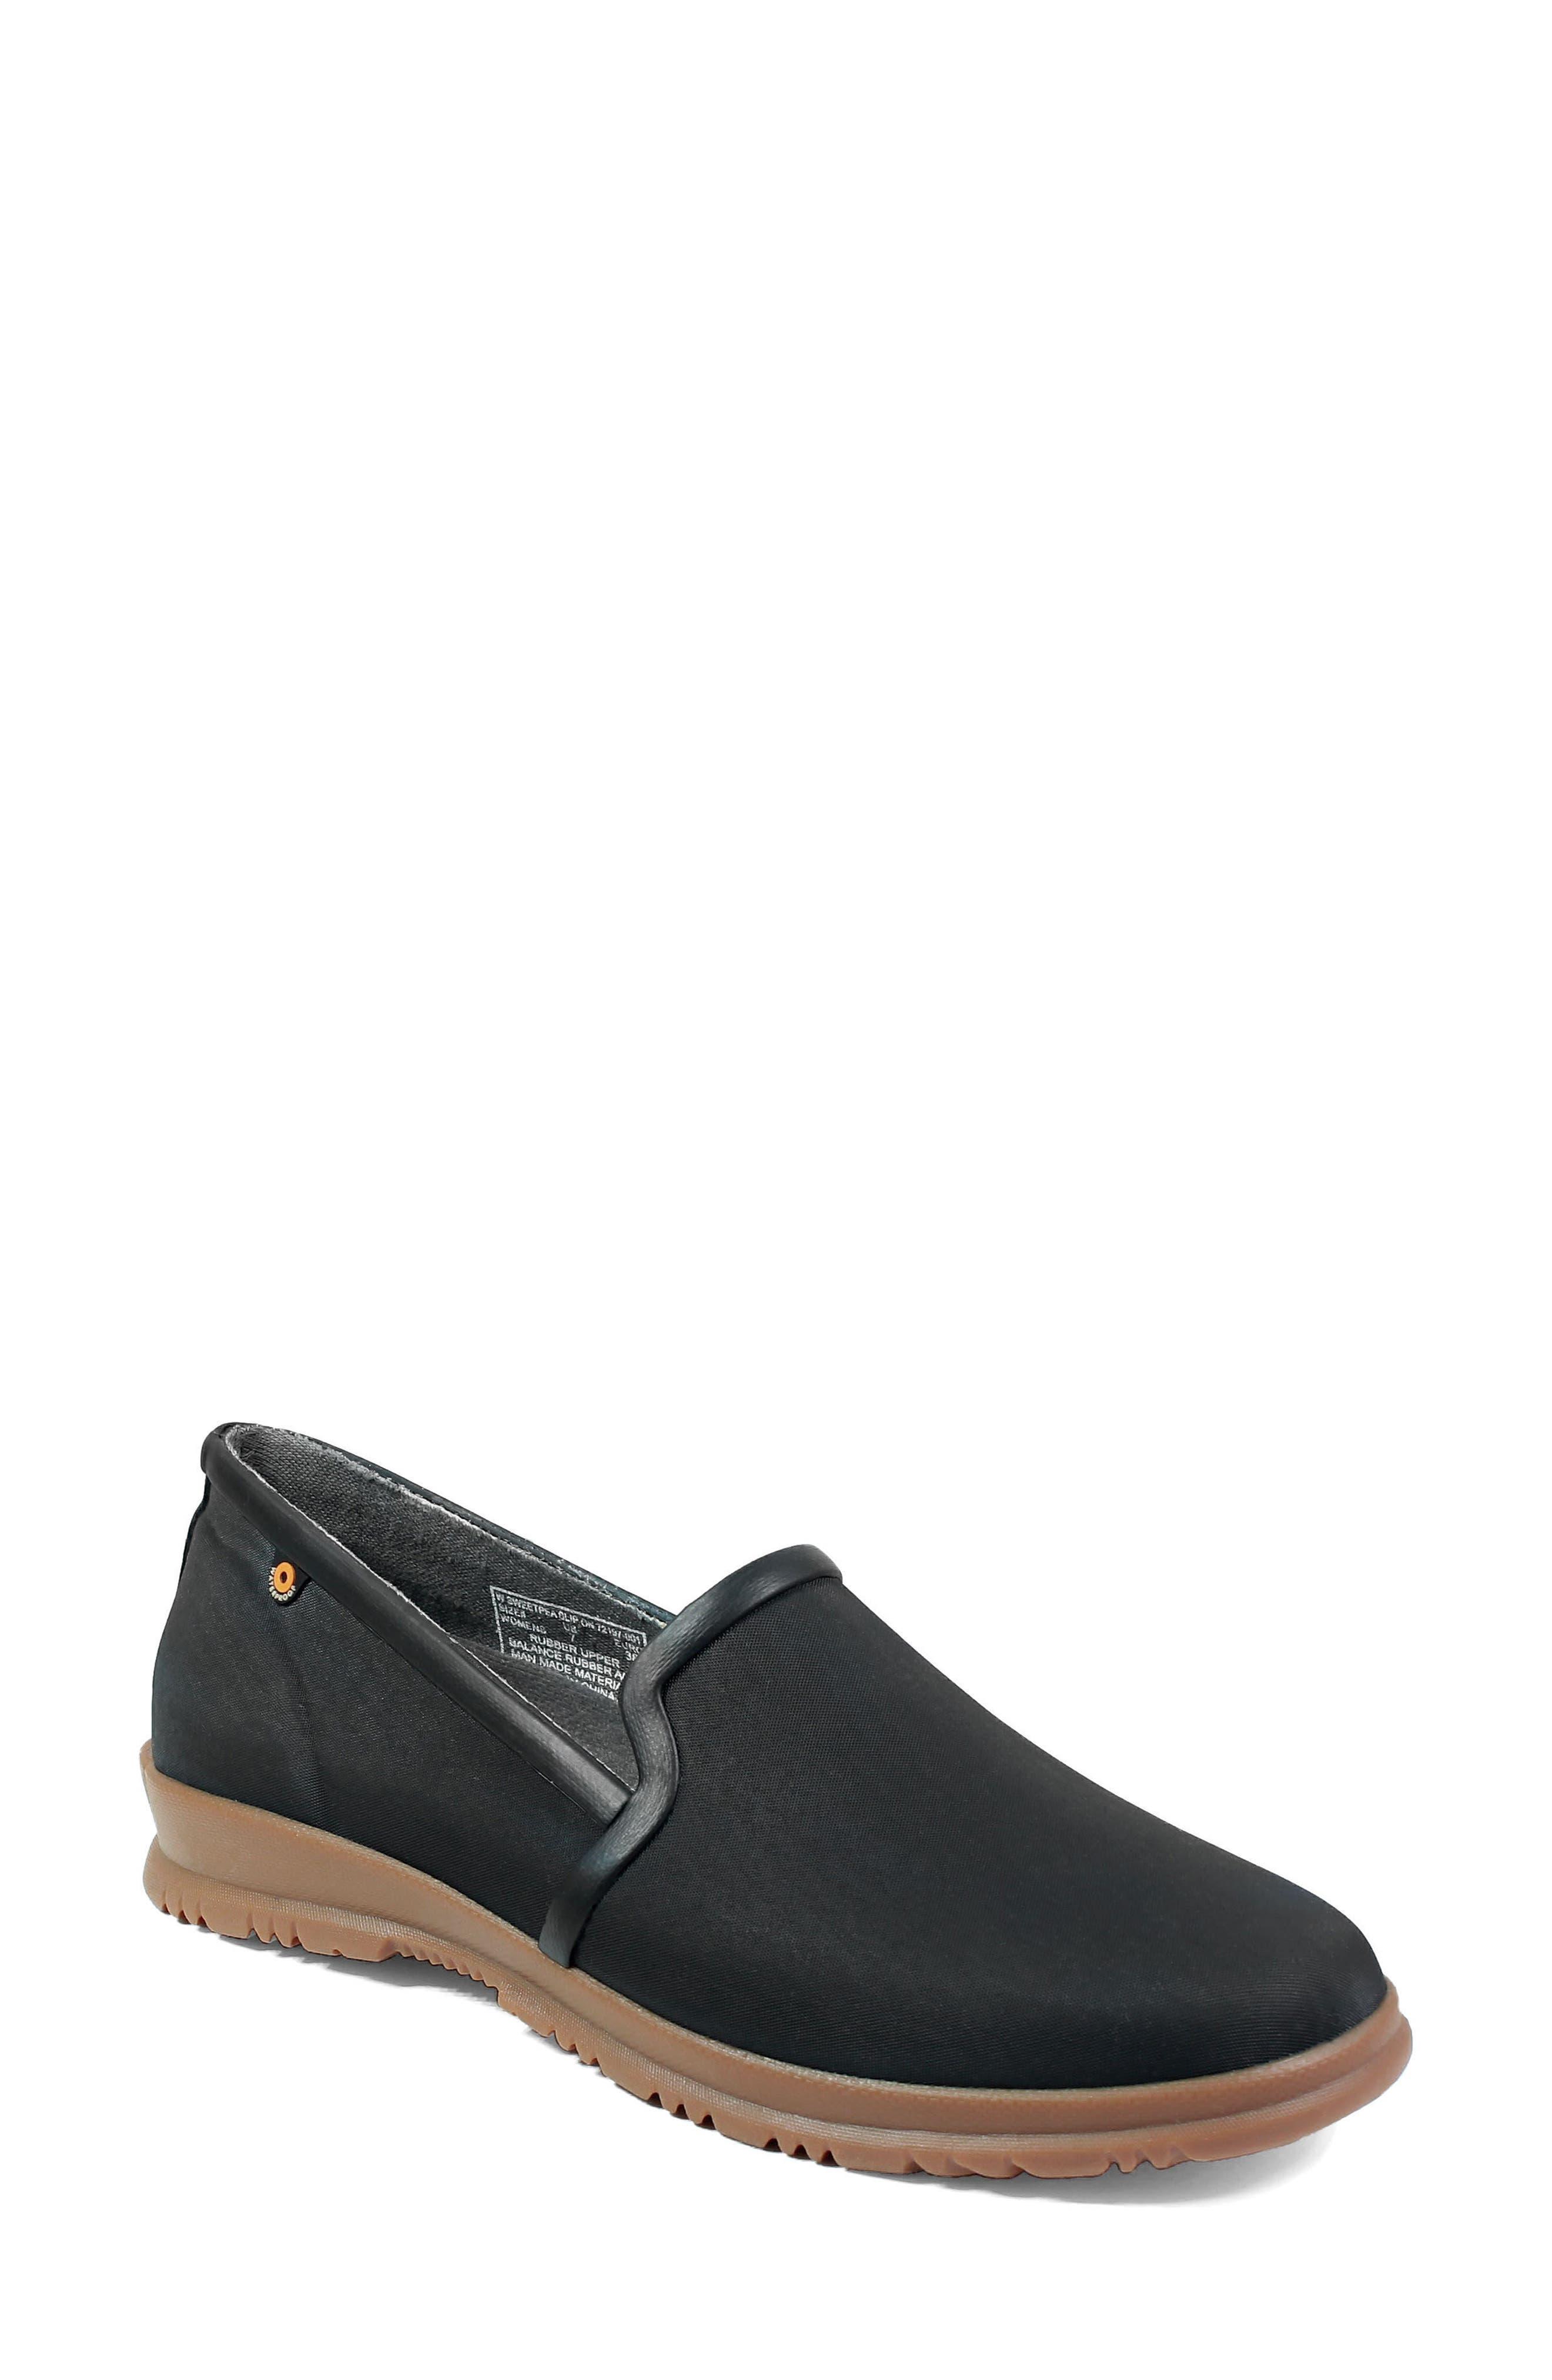 BOGS Sweetpea Waterproof Slip-On Sneaker, Main, color, 001